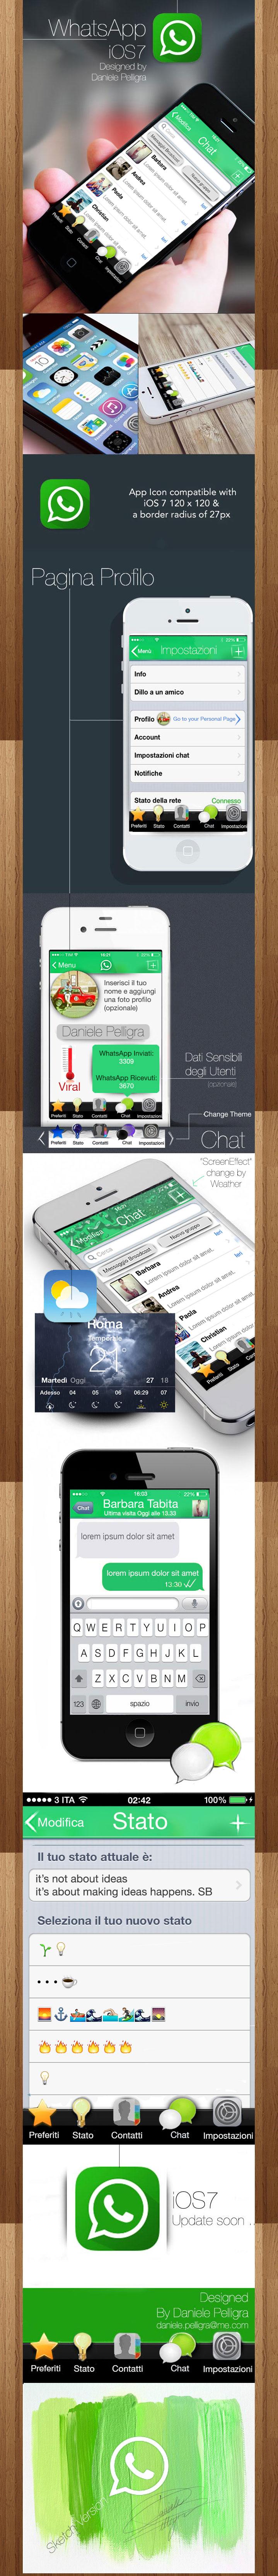 whats-app-ios-7